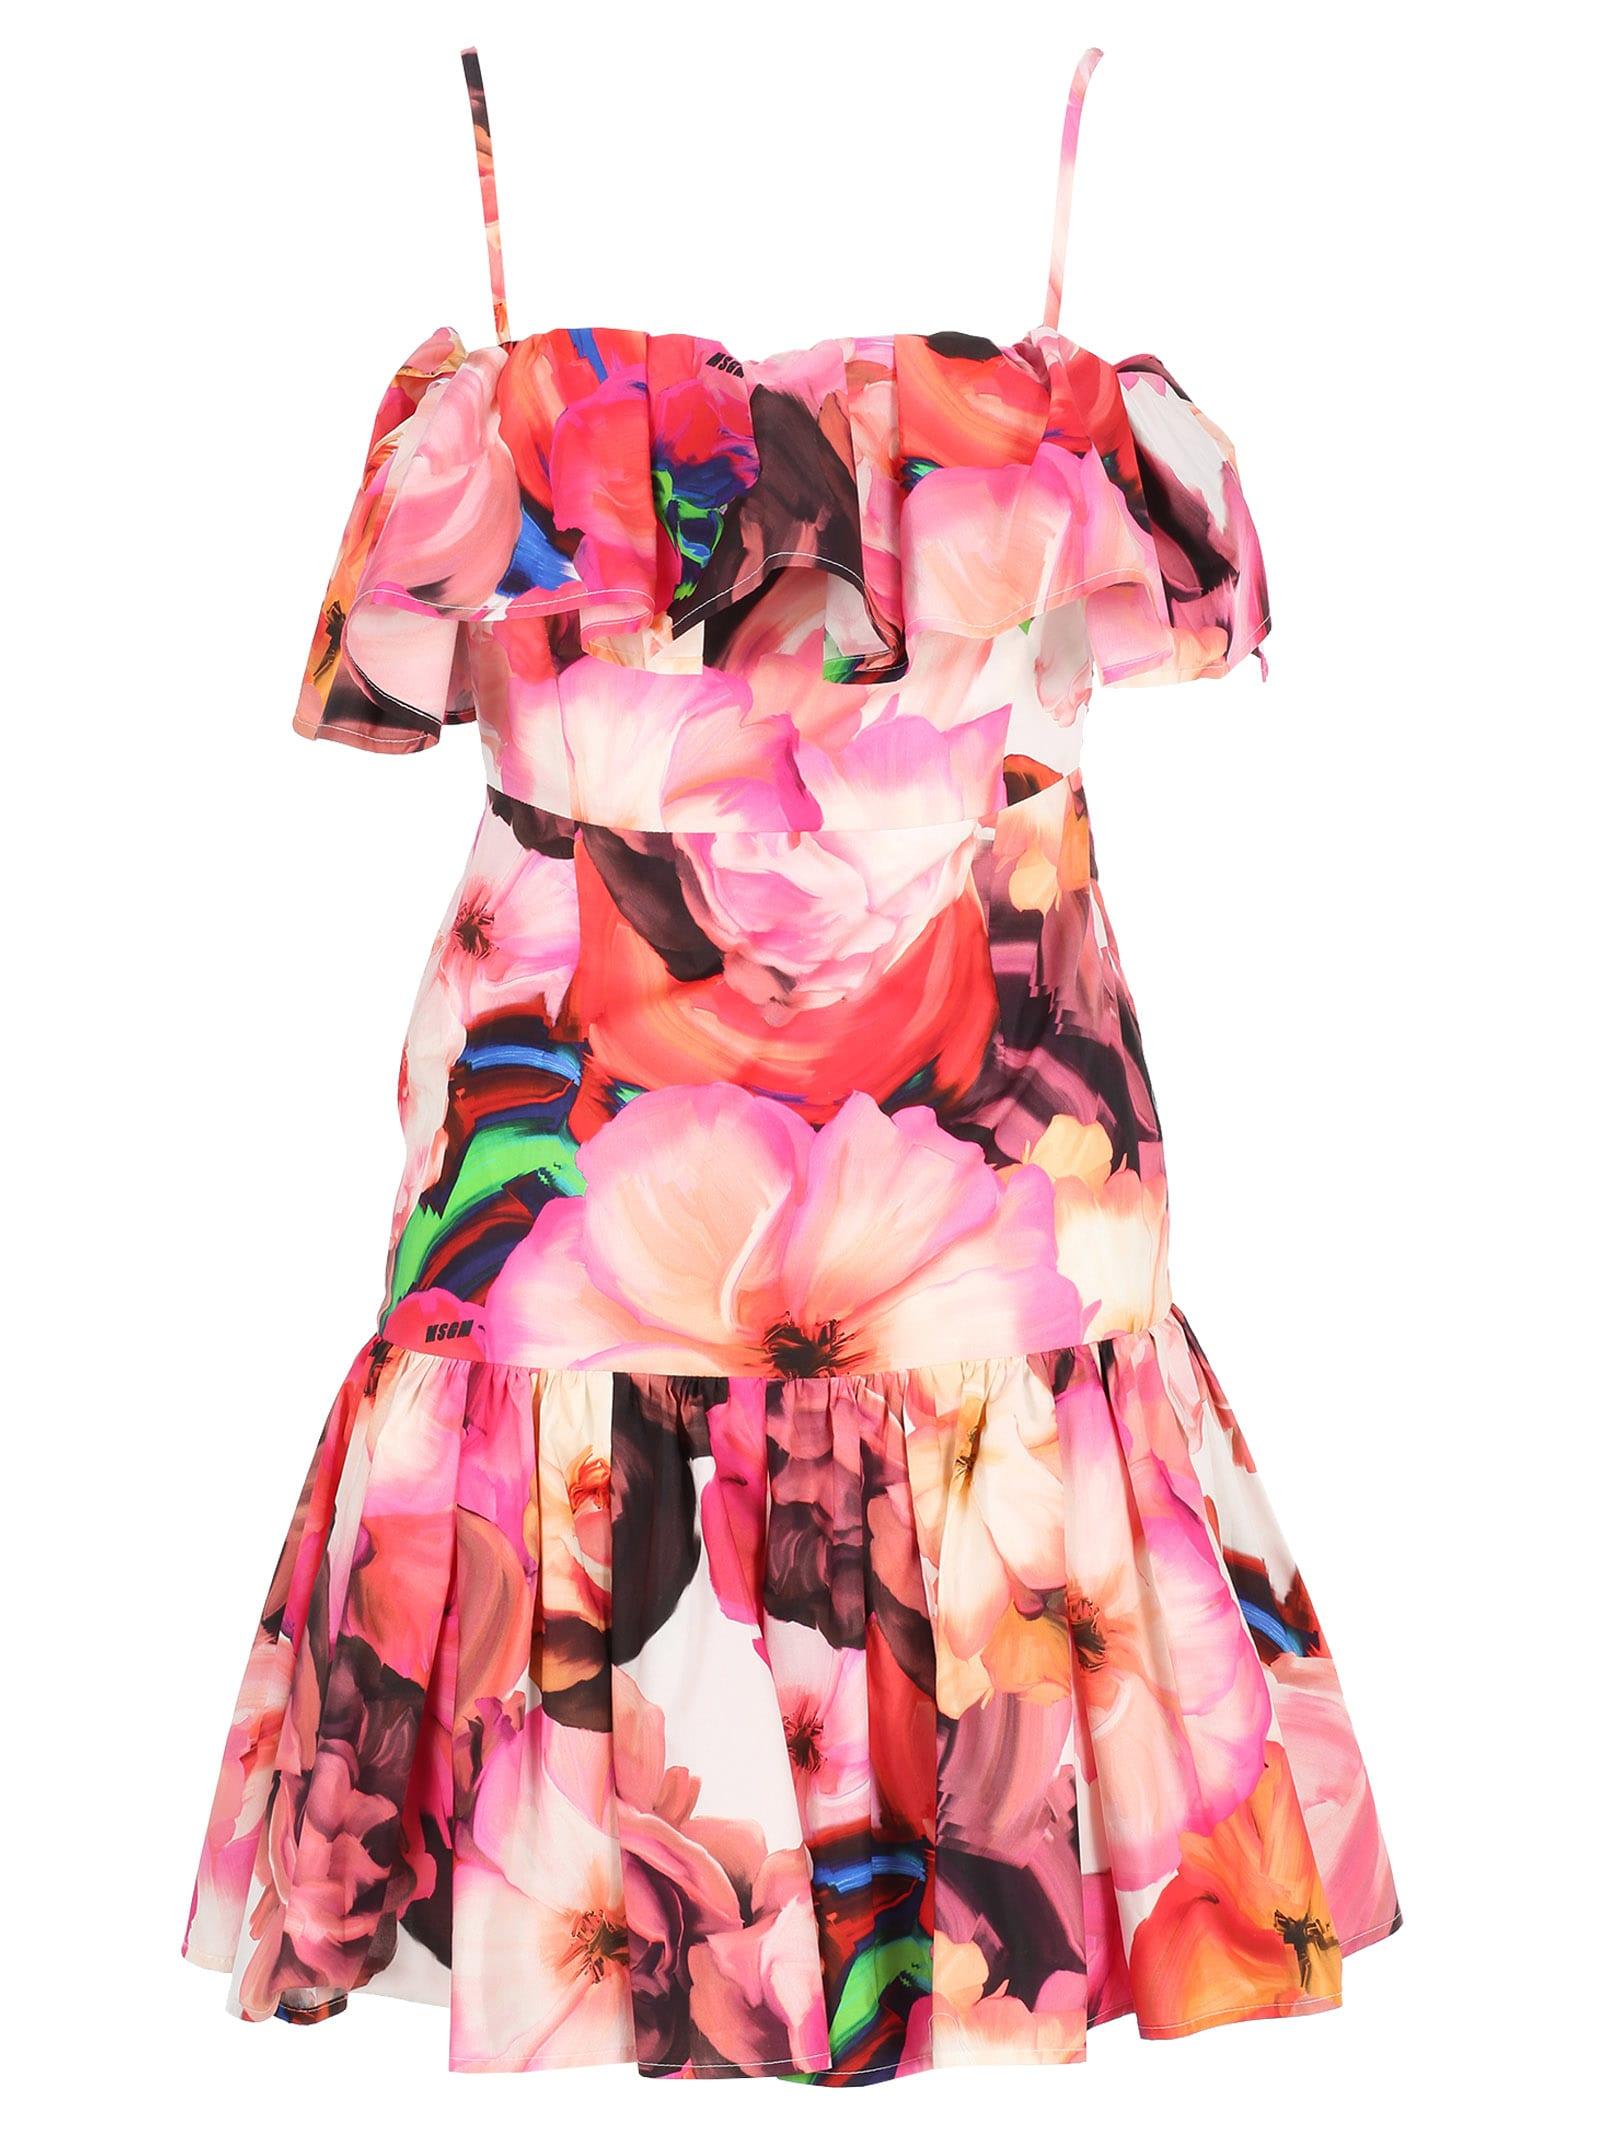 Msgm Msgm Floral Print Ruffles Dress